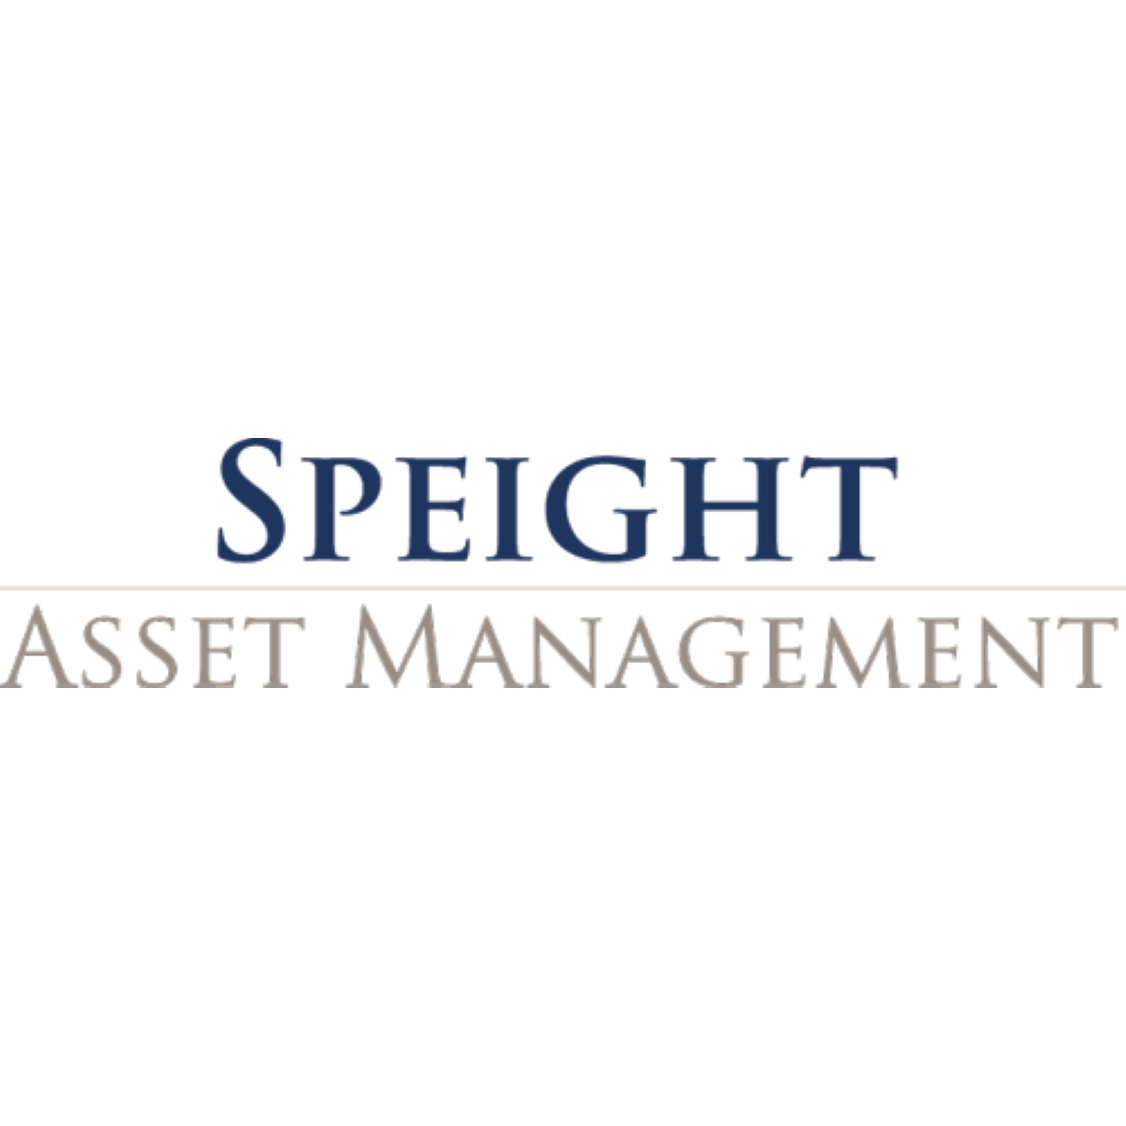 Speight Asset Management